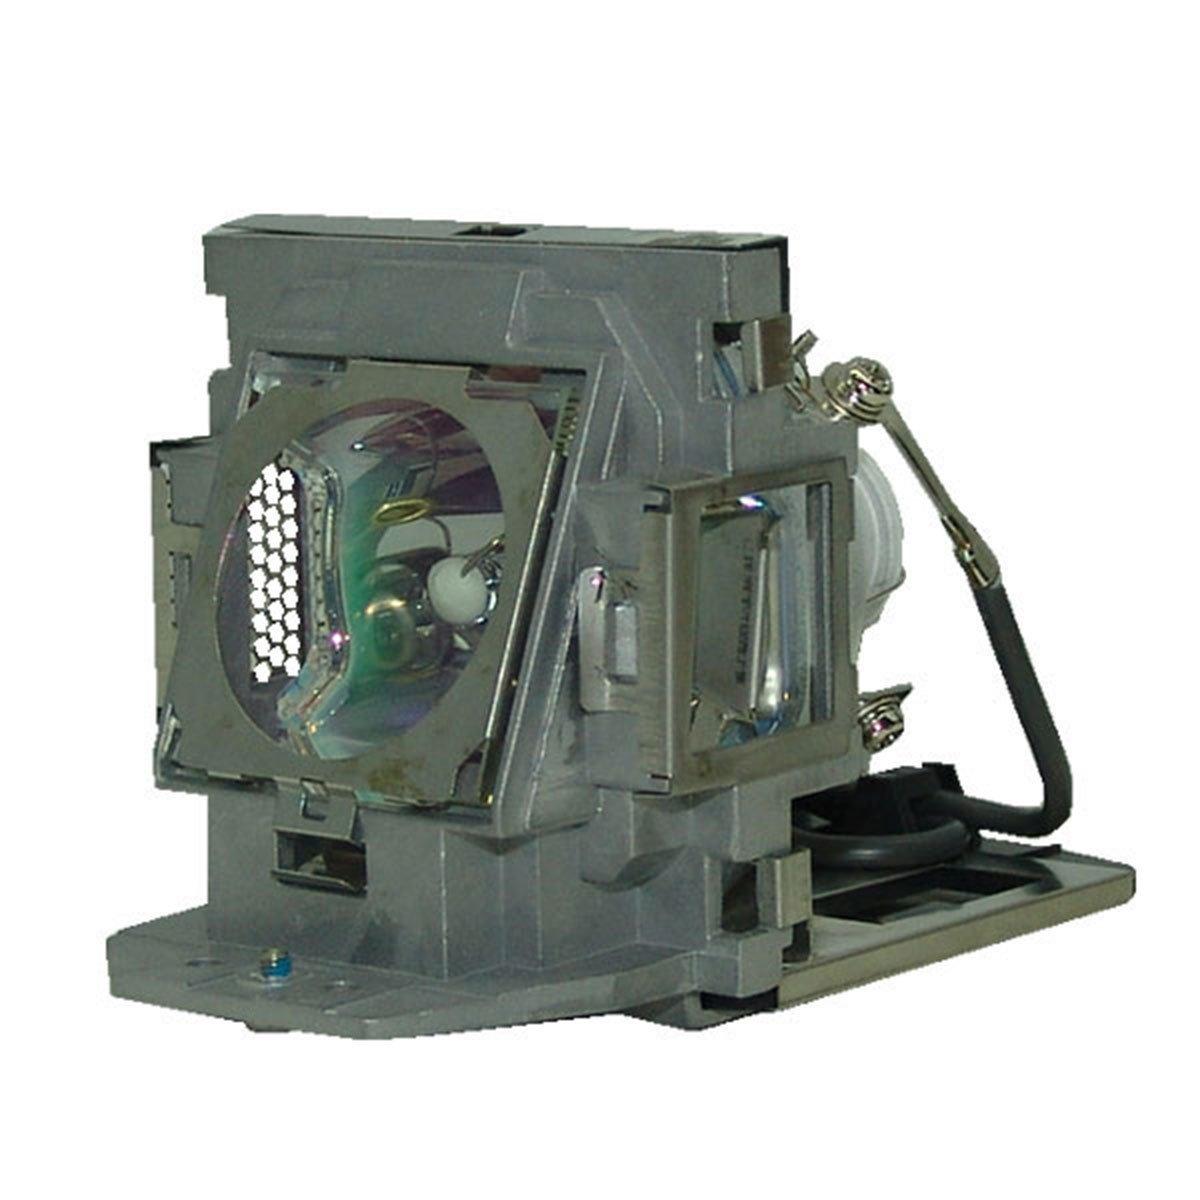 Lutema 9E.0CG03.001 BenQ, LCD/DLP Projector Lamp, Philips Inside